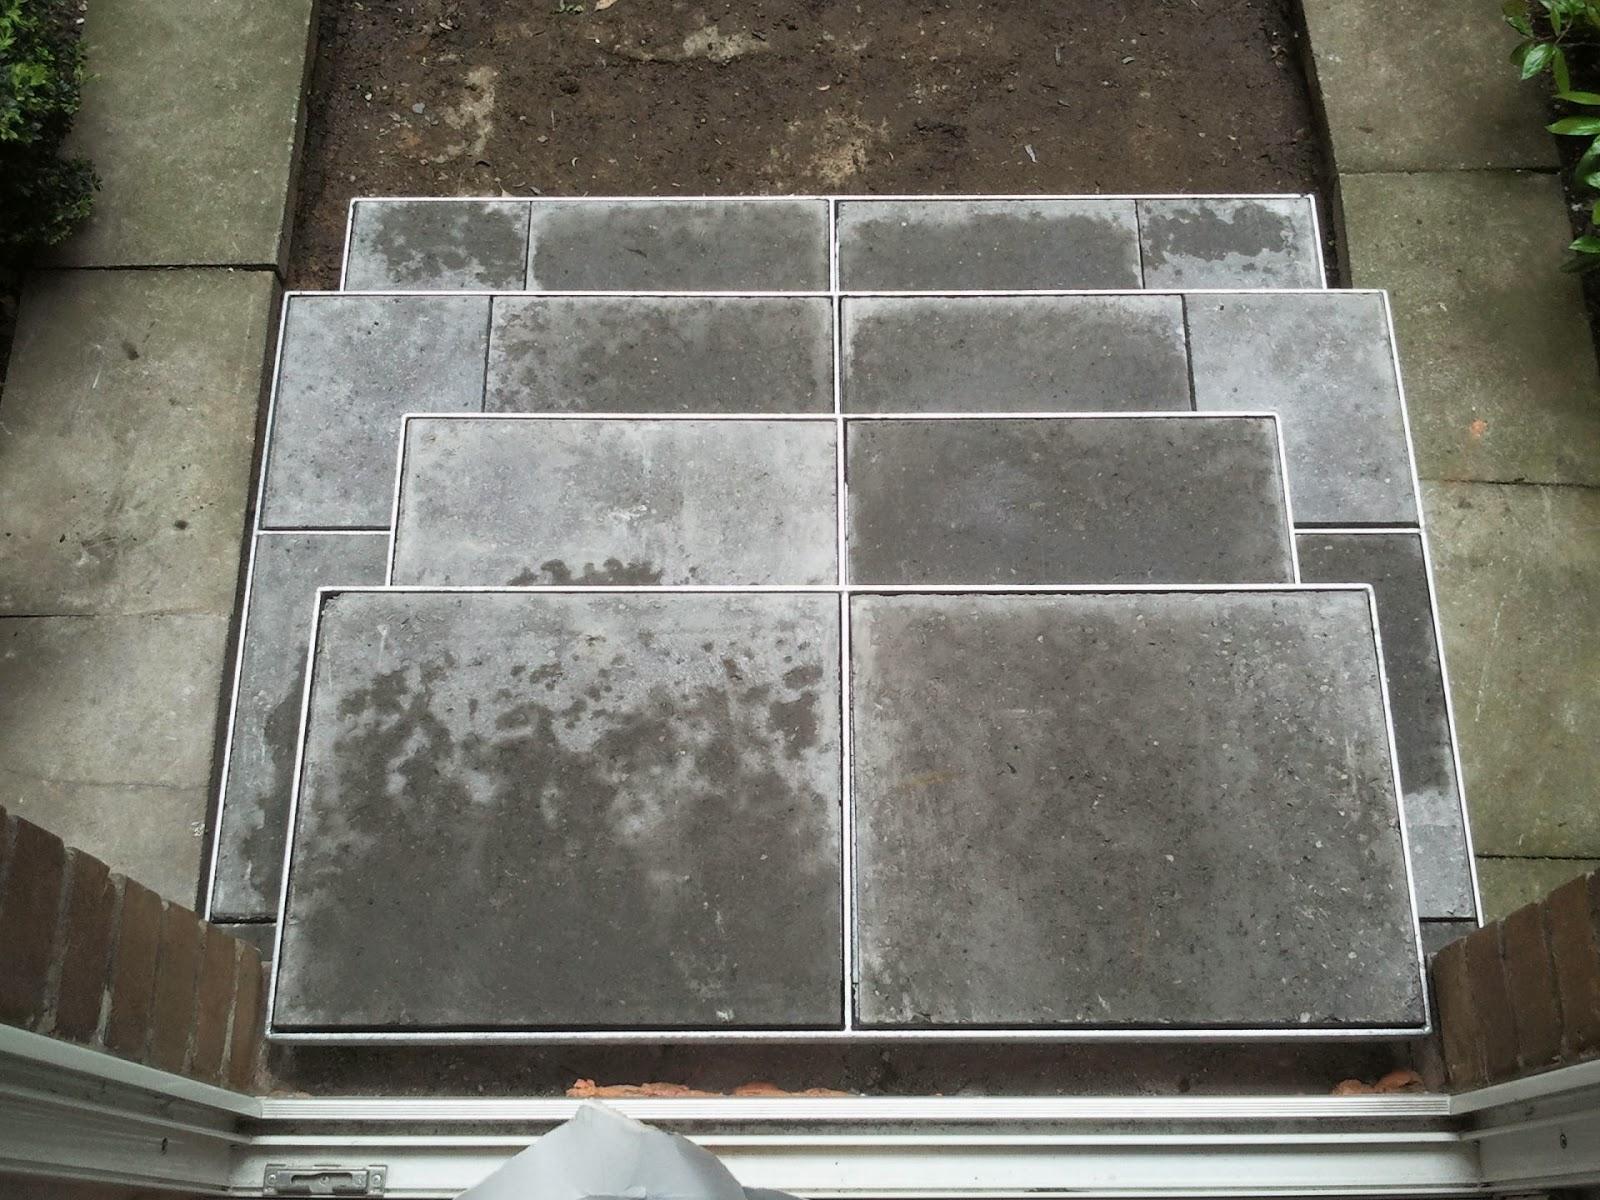 lockere gehwegplatten befestigen